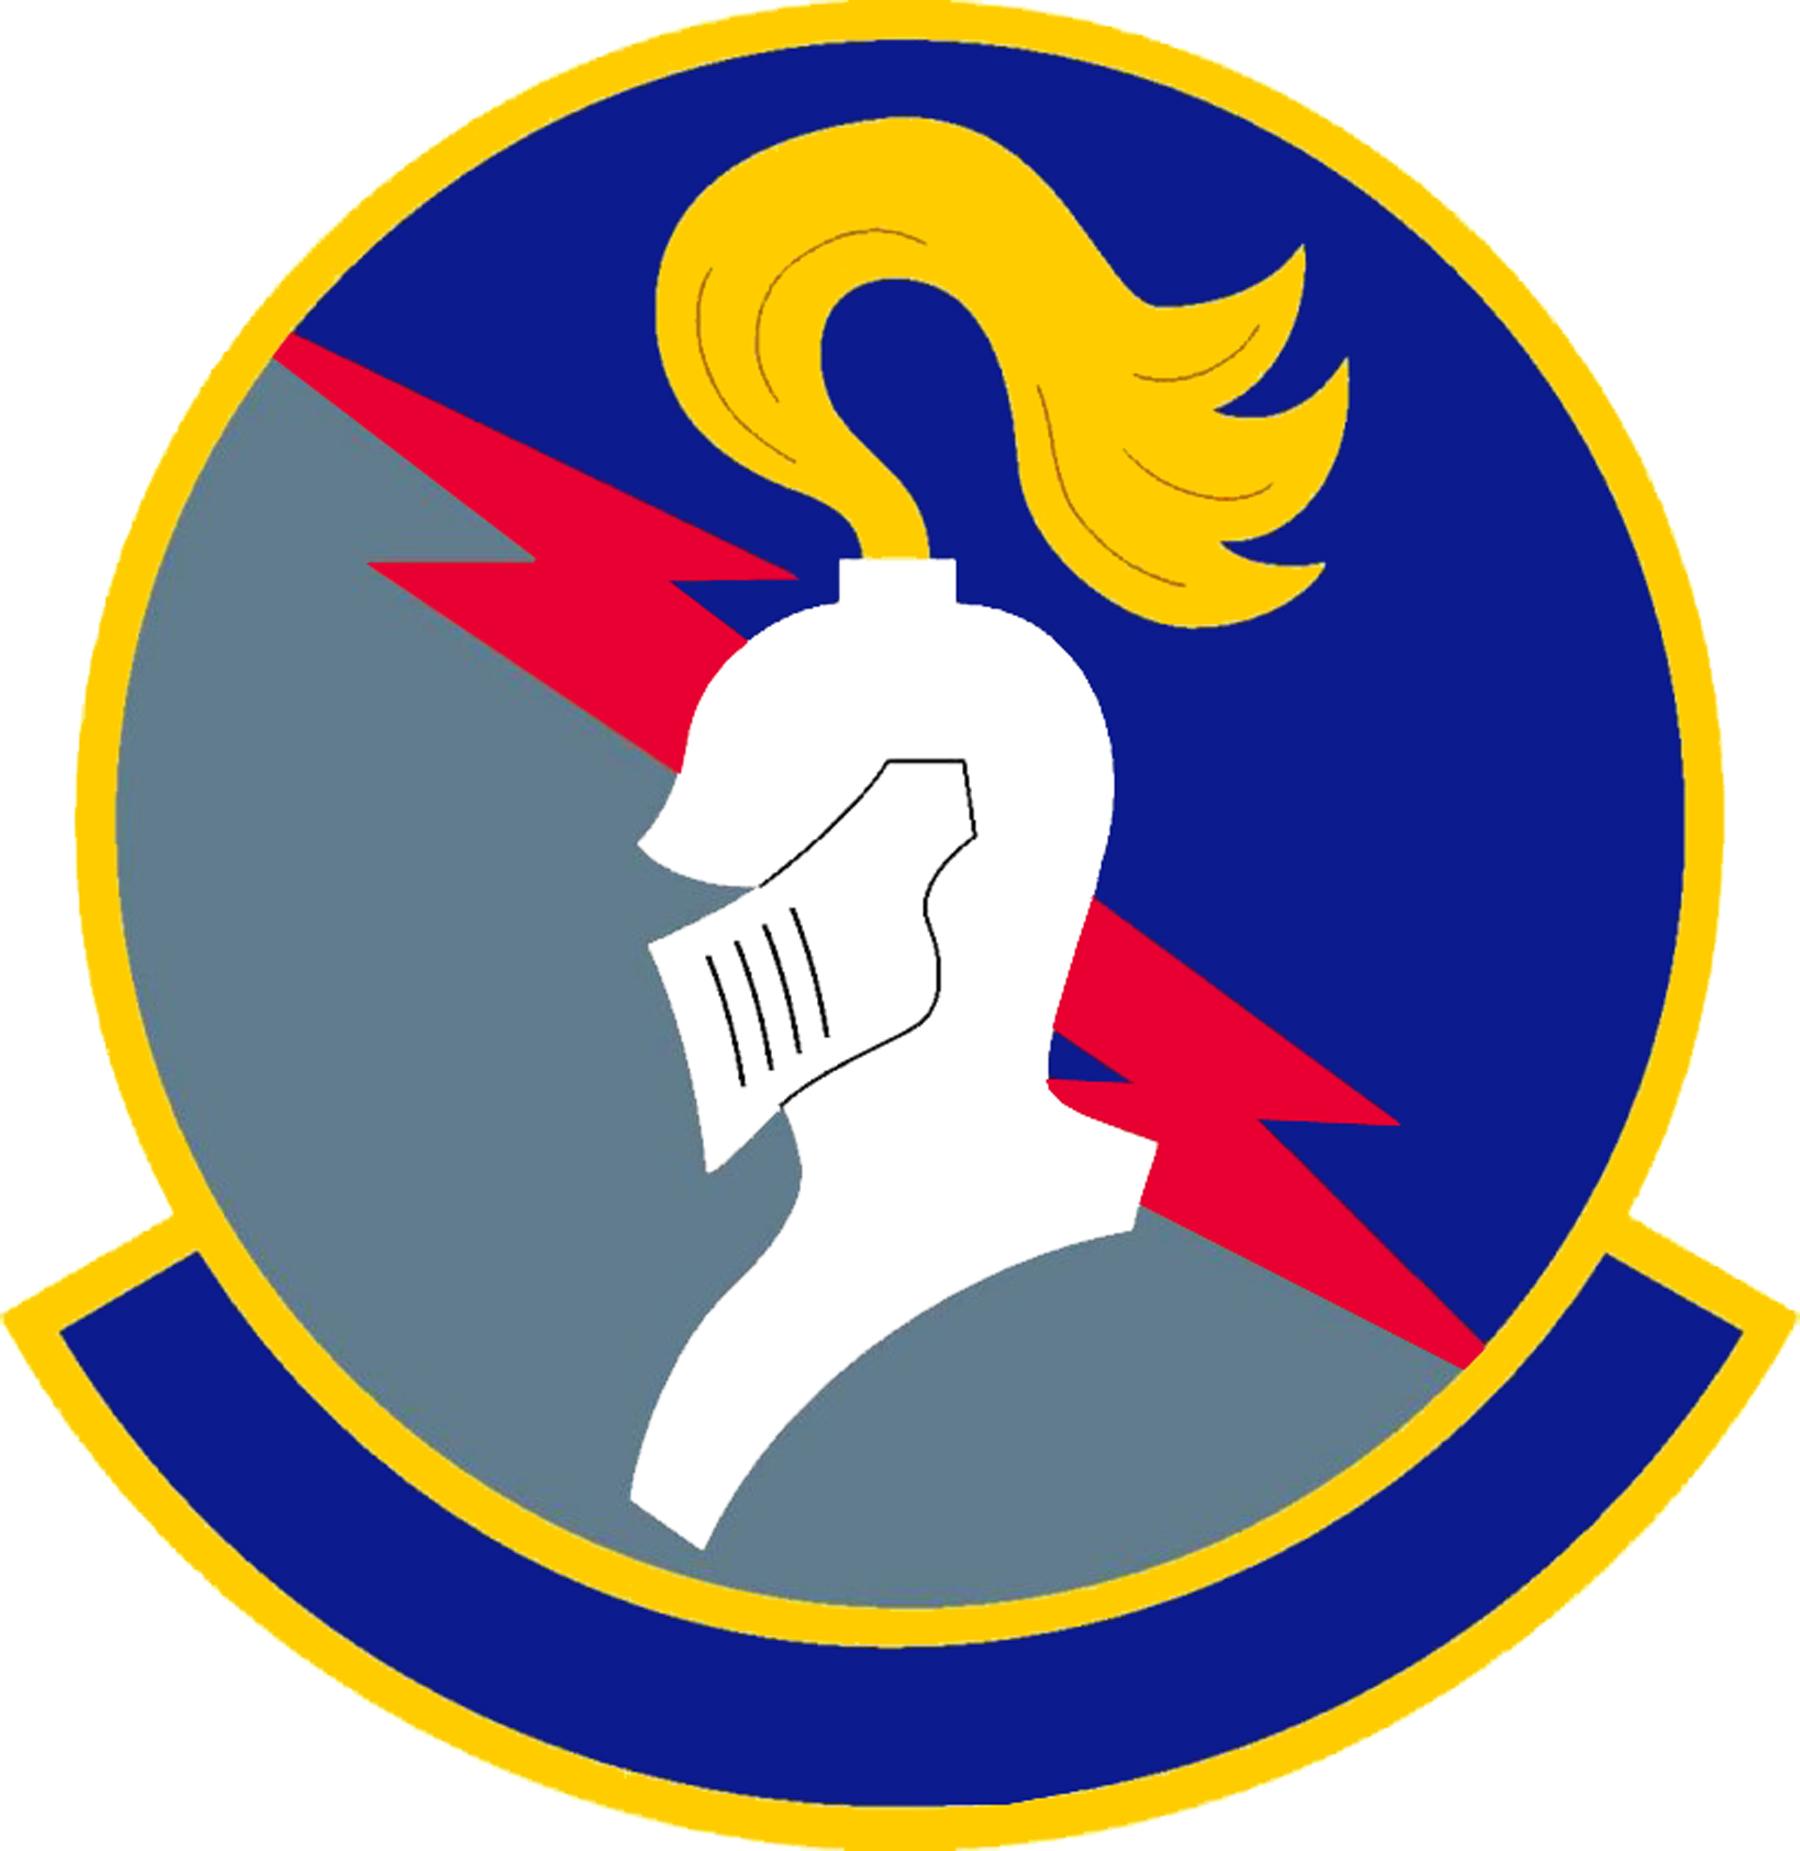 824 Base Defense Squadron (ACC)